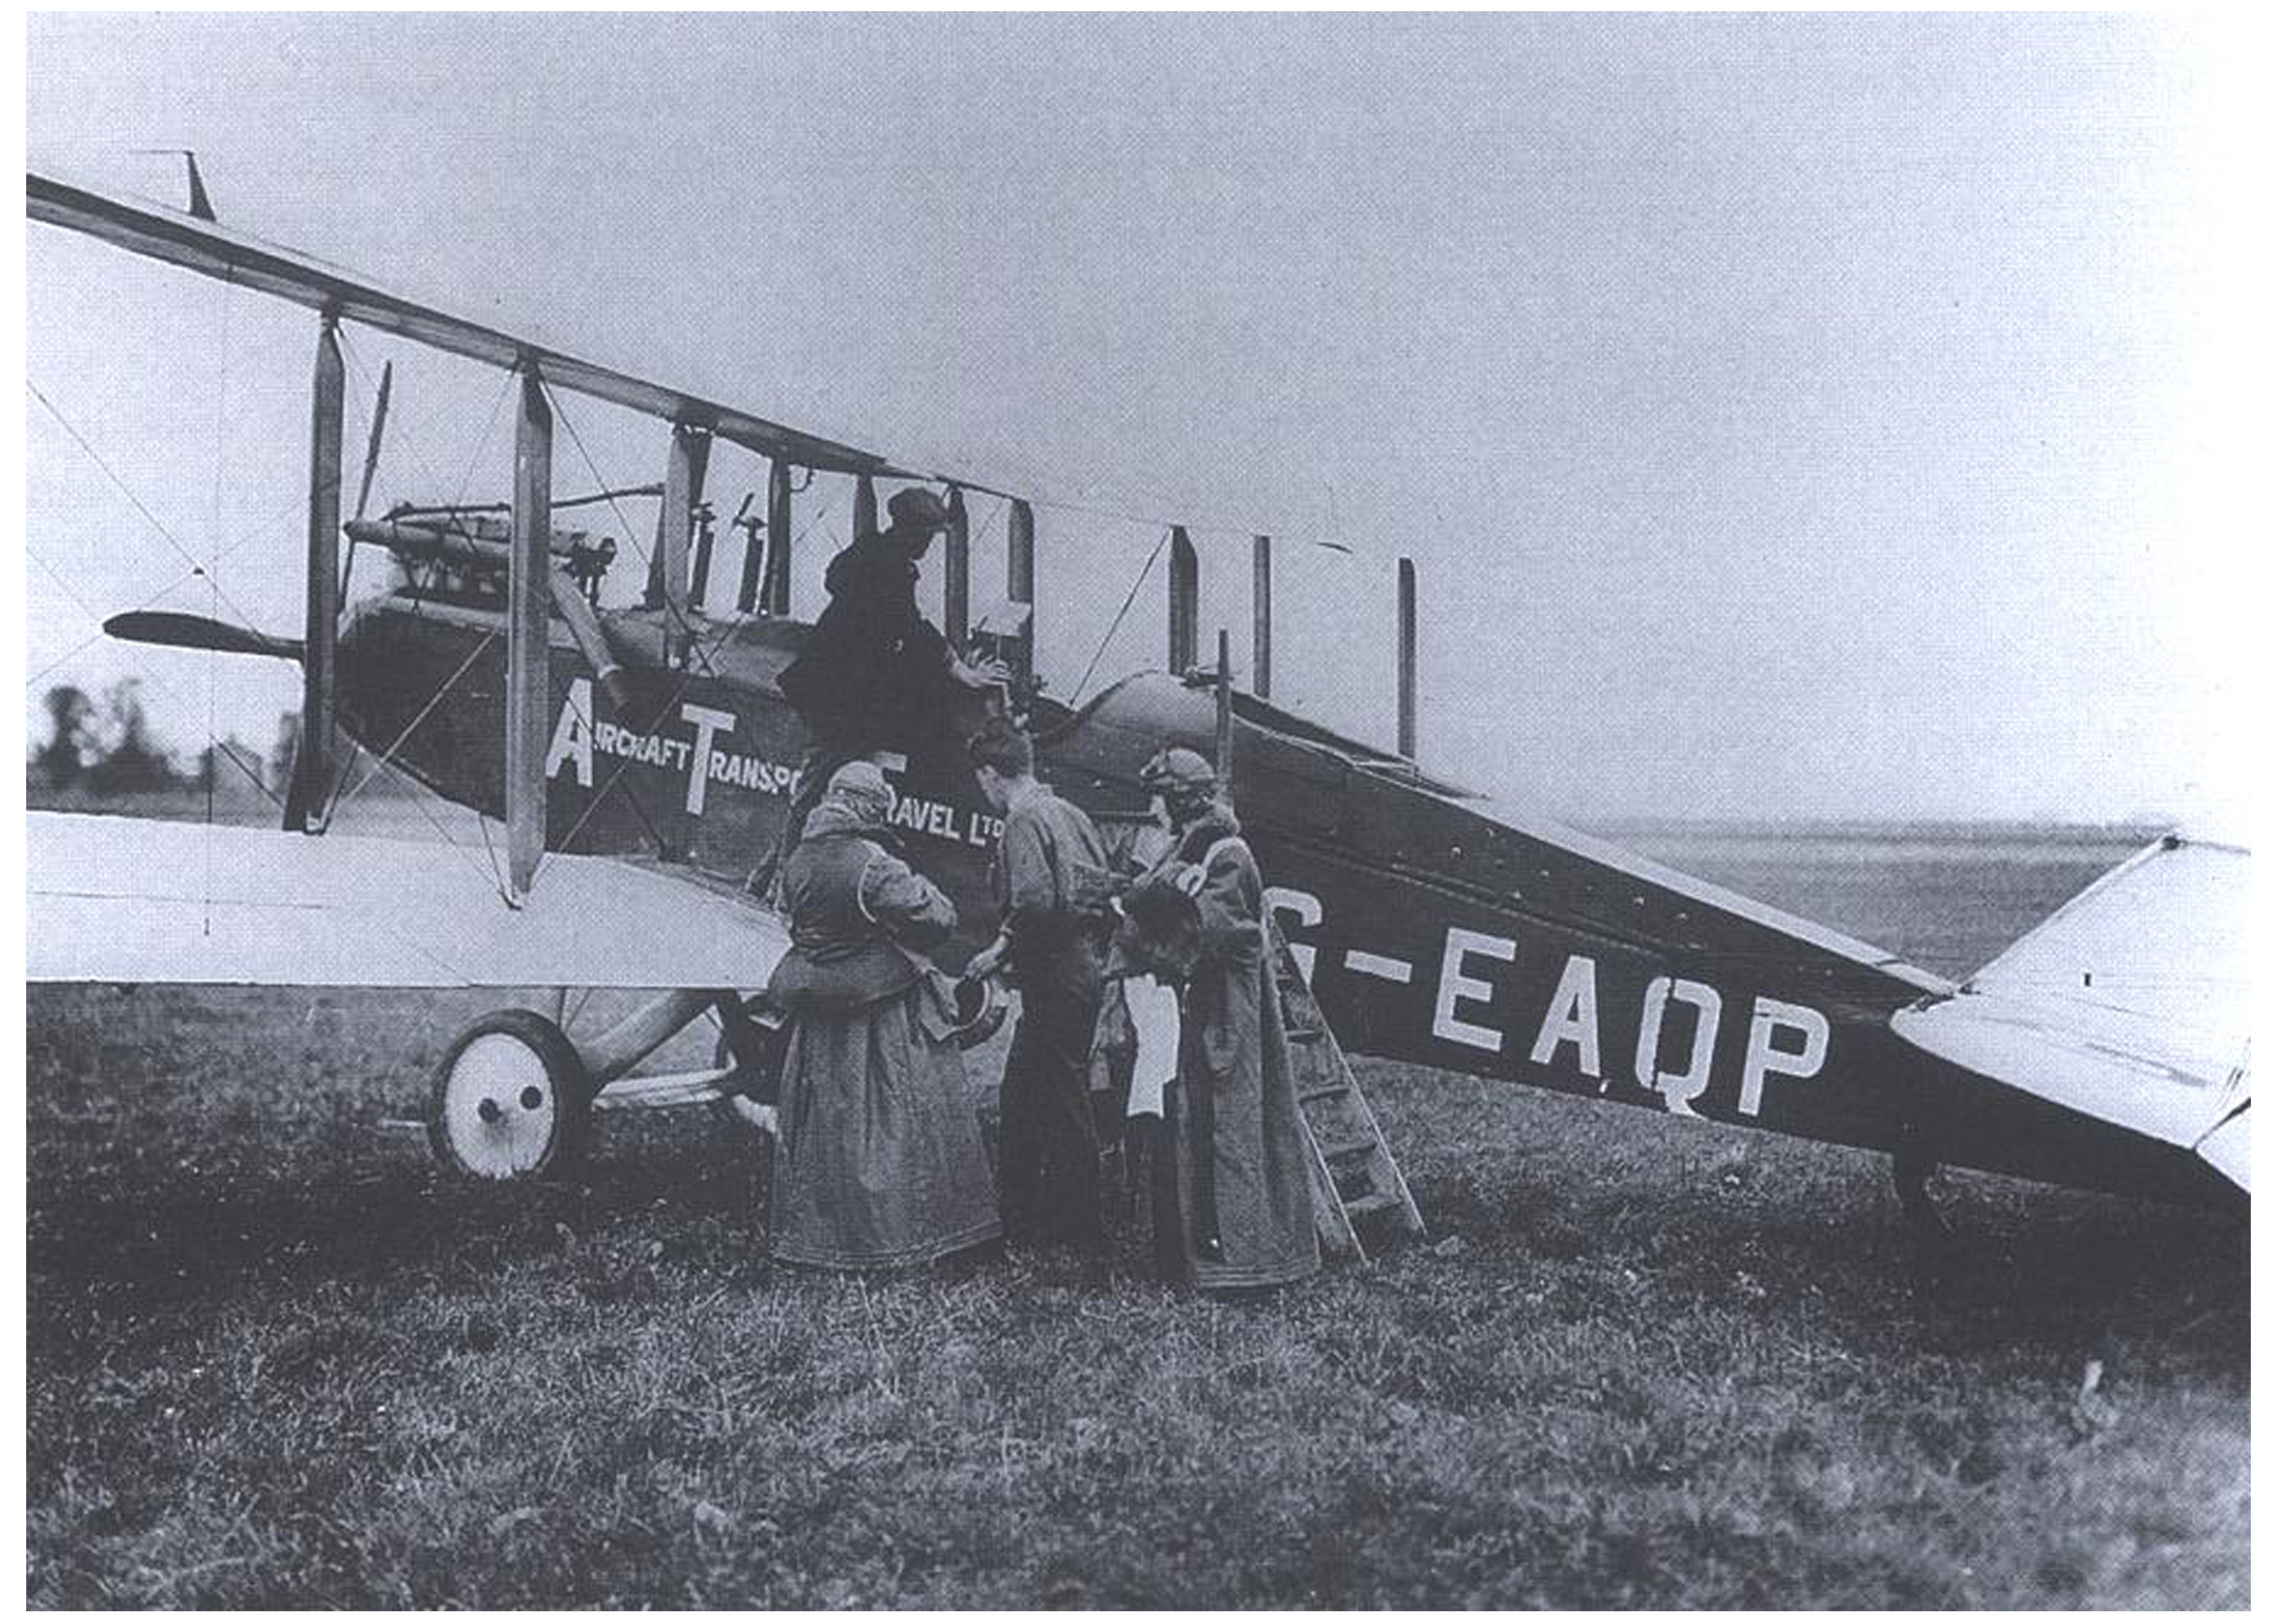 Schiphol-100-Eerste-lijnvlucht-met-DH-9-B-Air-Transport-Travel-1920-e1464269920207